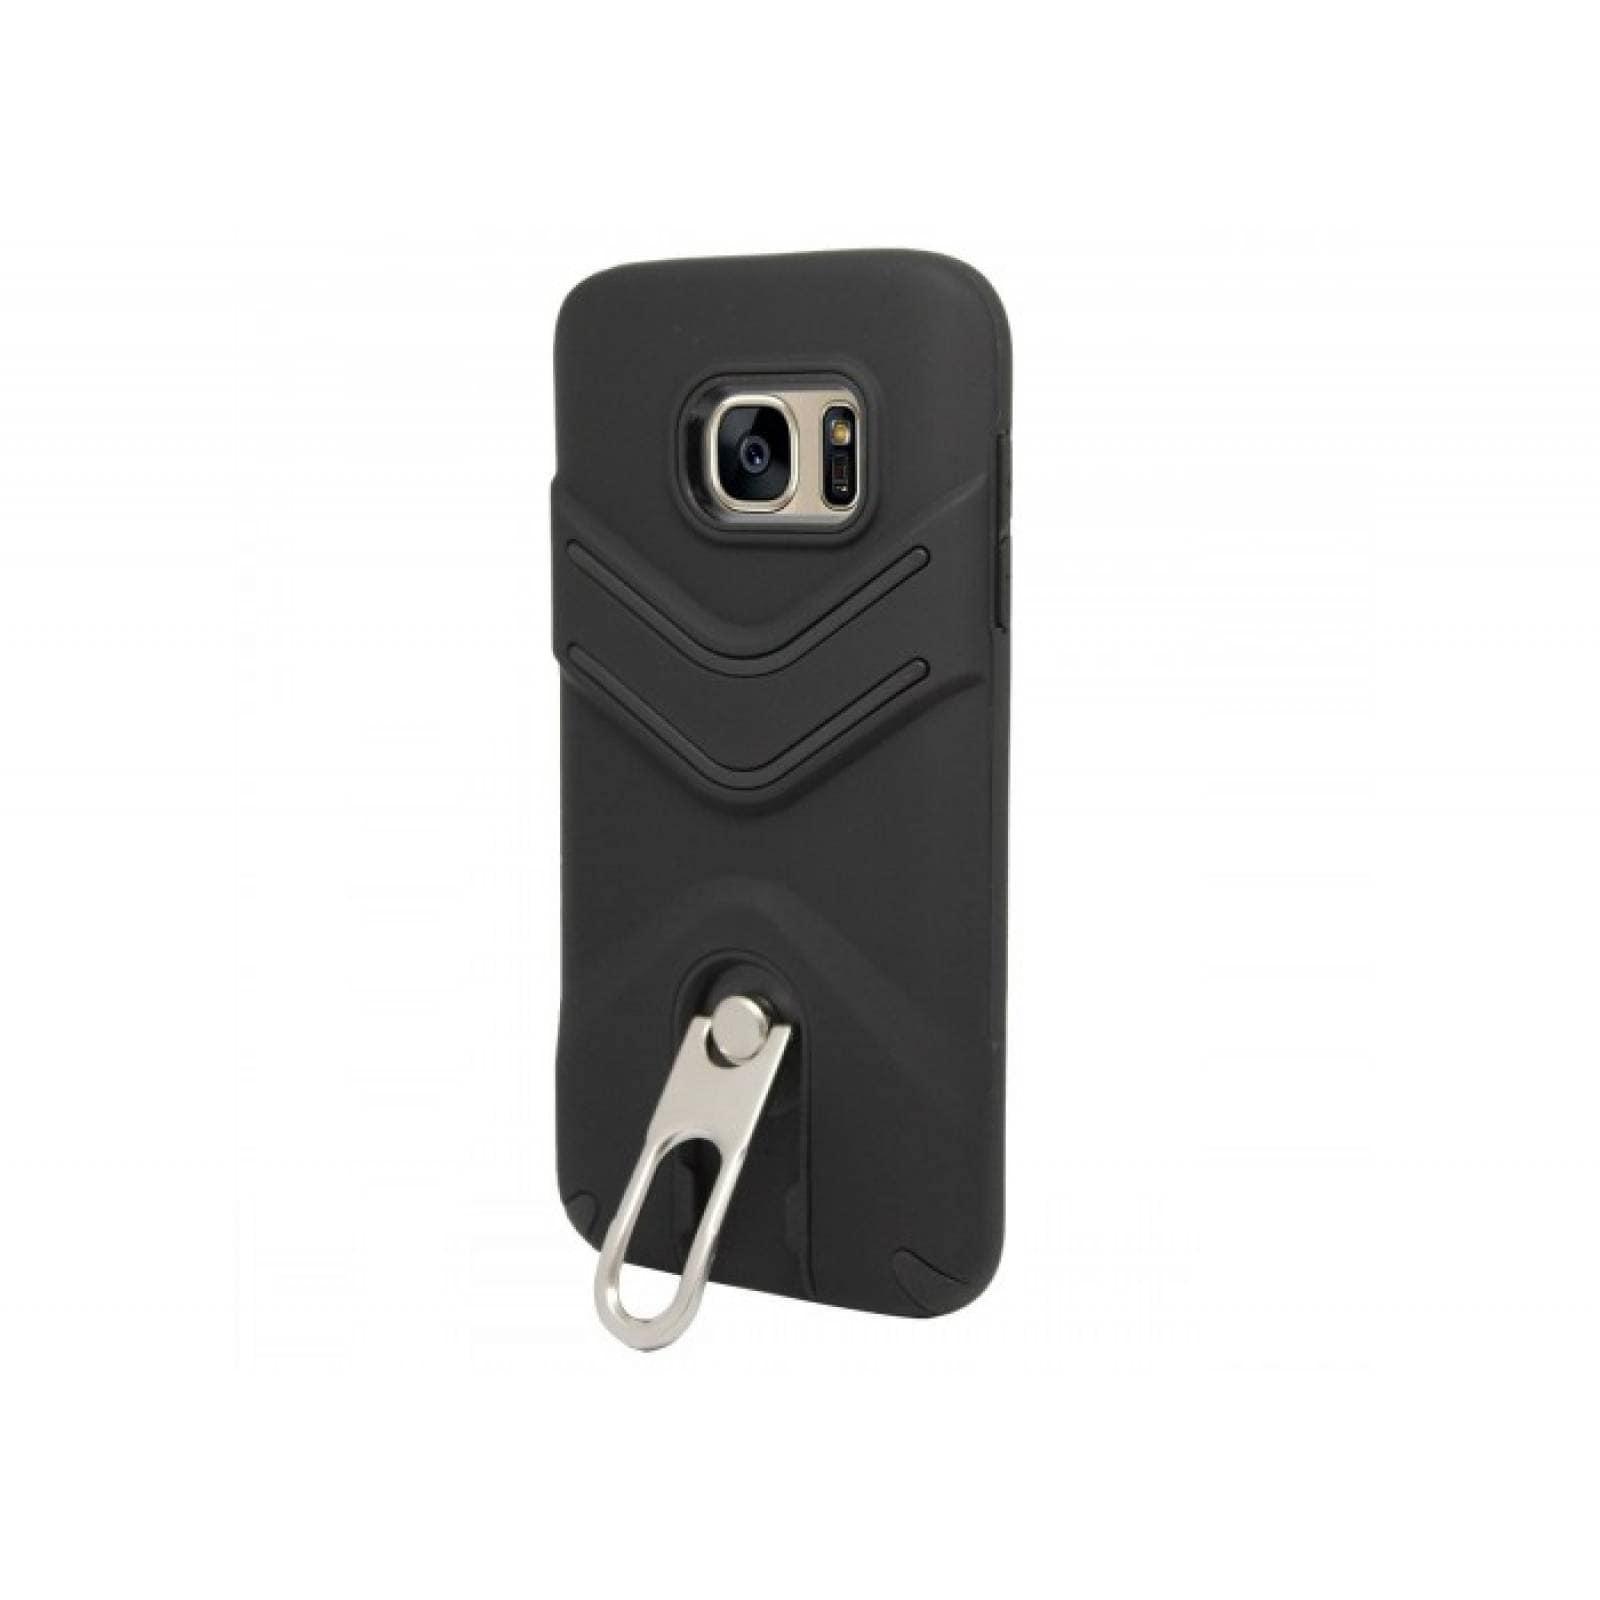 Funda Case Galaxy S7 Edge SM-G935F Protector Uso Rudo Iron Bear